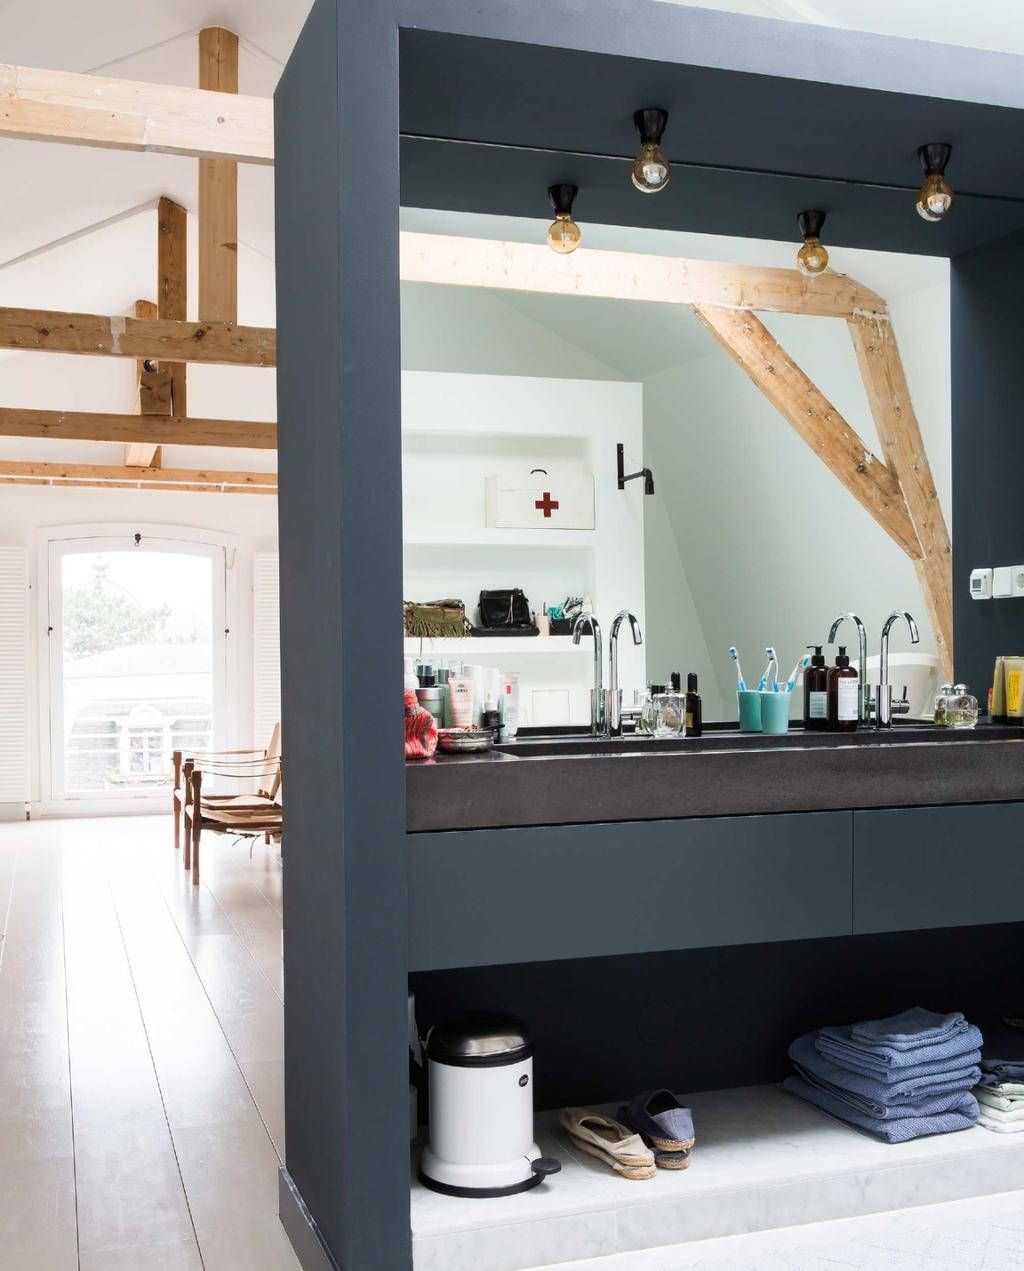 badkamer | slaapkamer | open badkamer | binnenkijken | balkonplafond